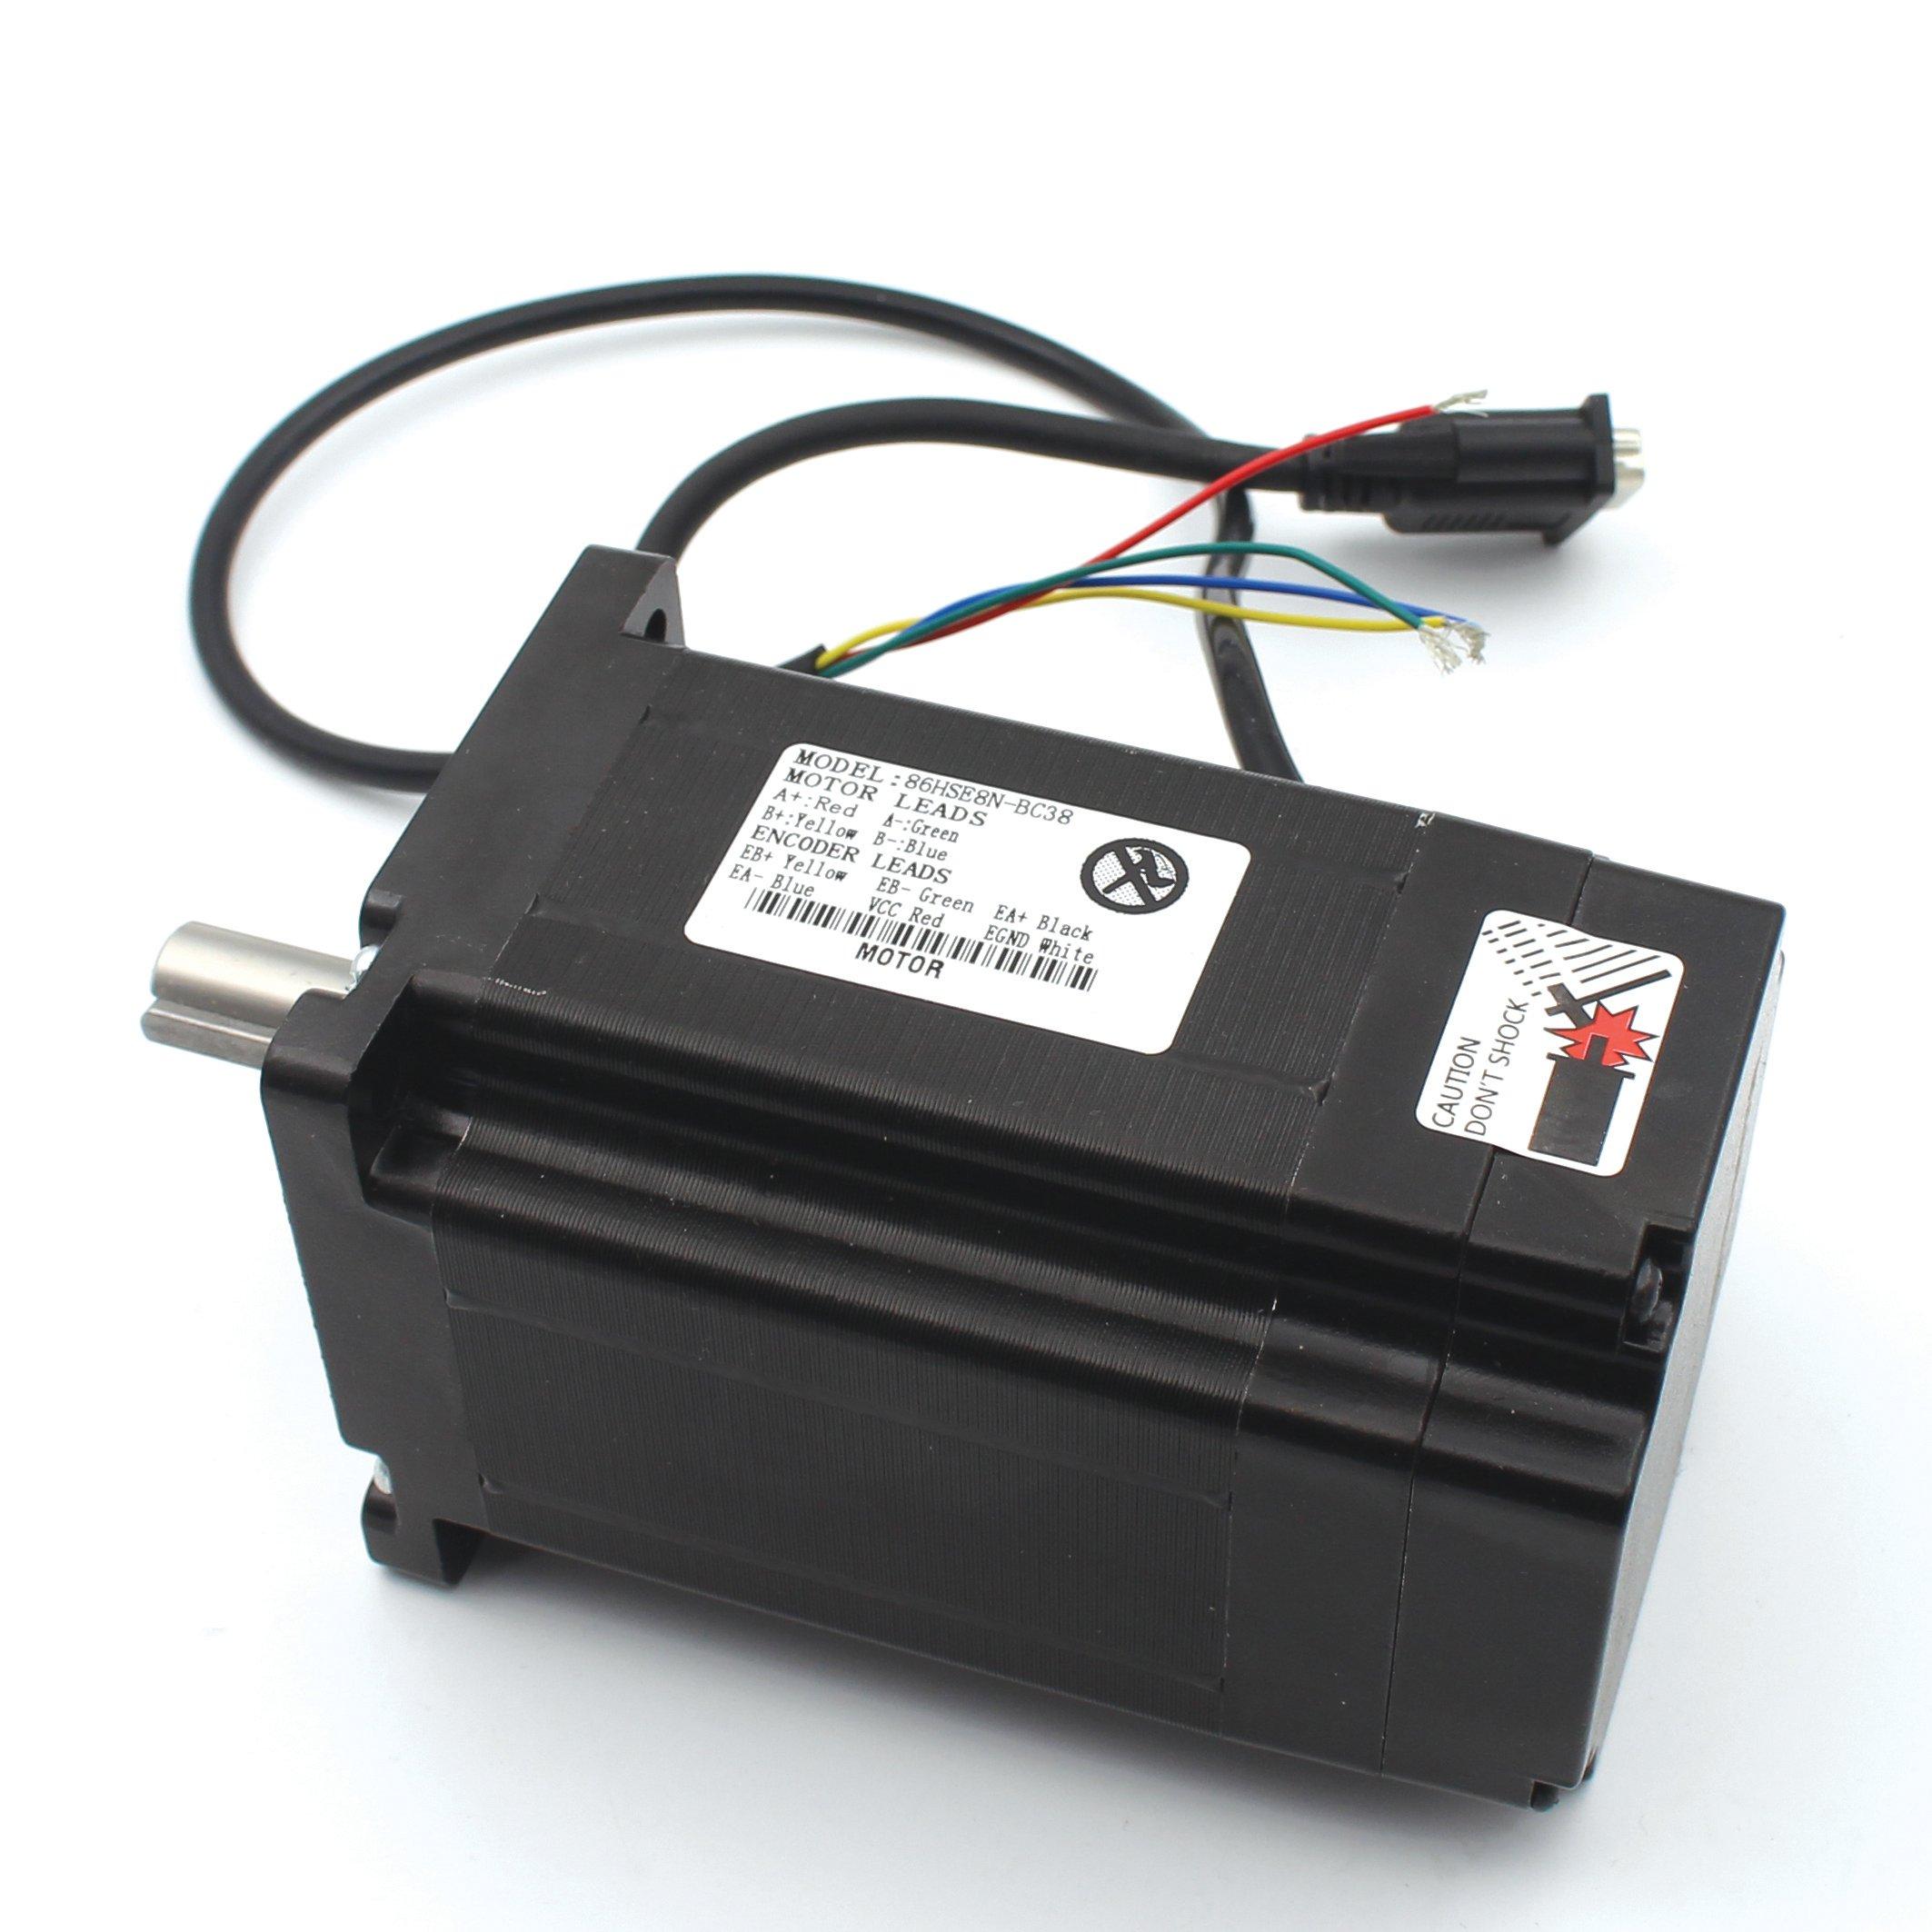 Nema34 8nm Closed Loop Stepper Servo Motor 116mm 6a 2 Phase Hss86 Controller Hybrid Driver 70v Ac 100v Dc Cnc Kit For Router Engraving